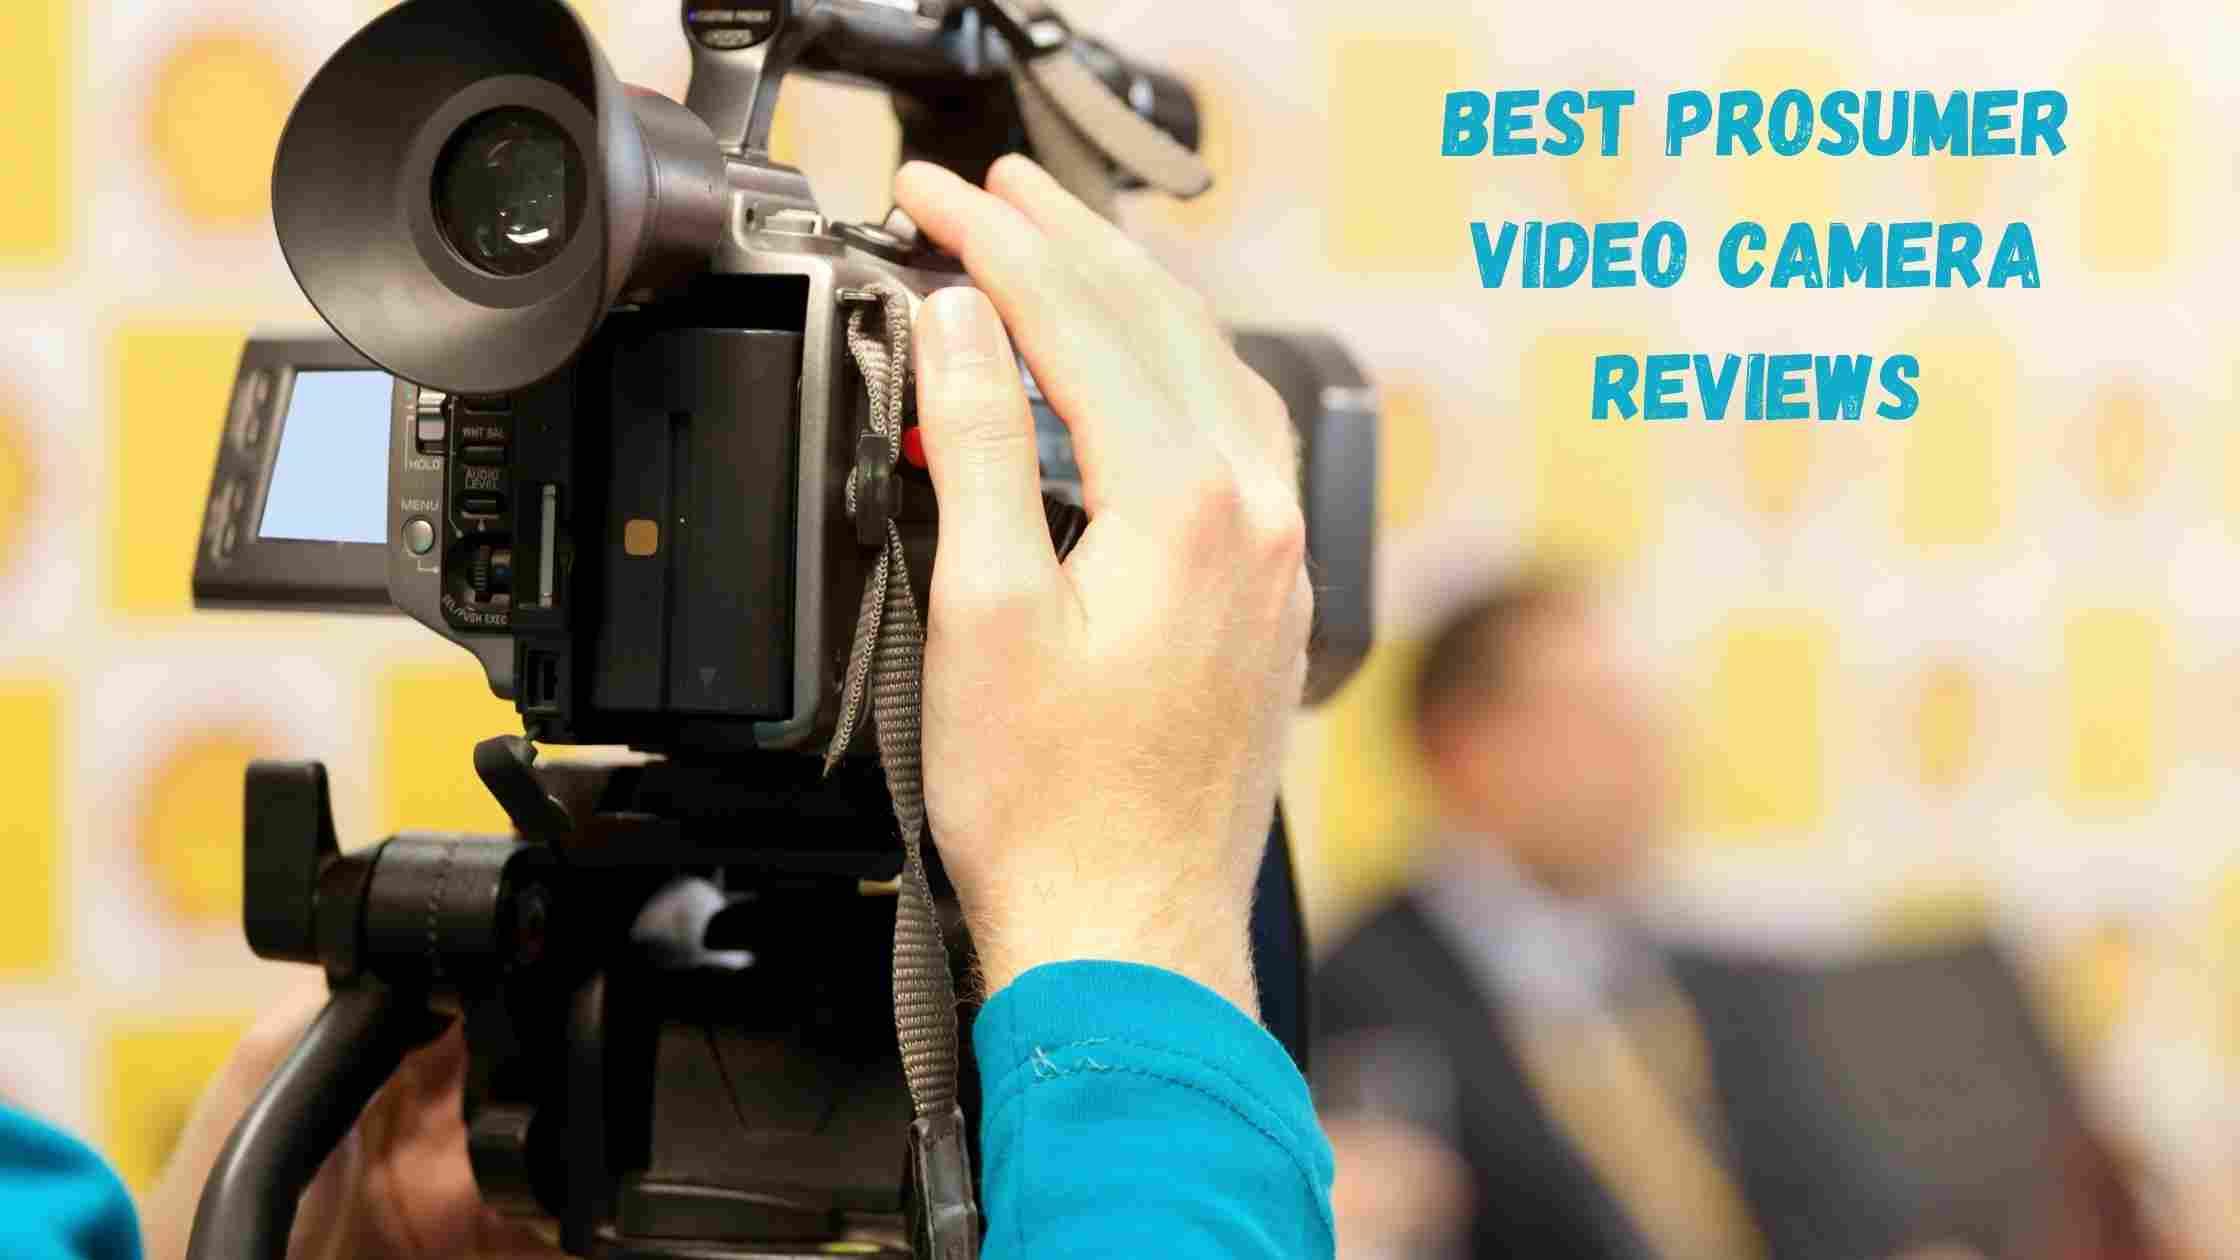 Best Prosumer Video Camera Reviews